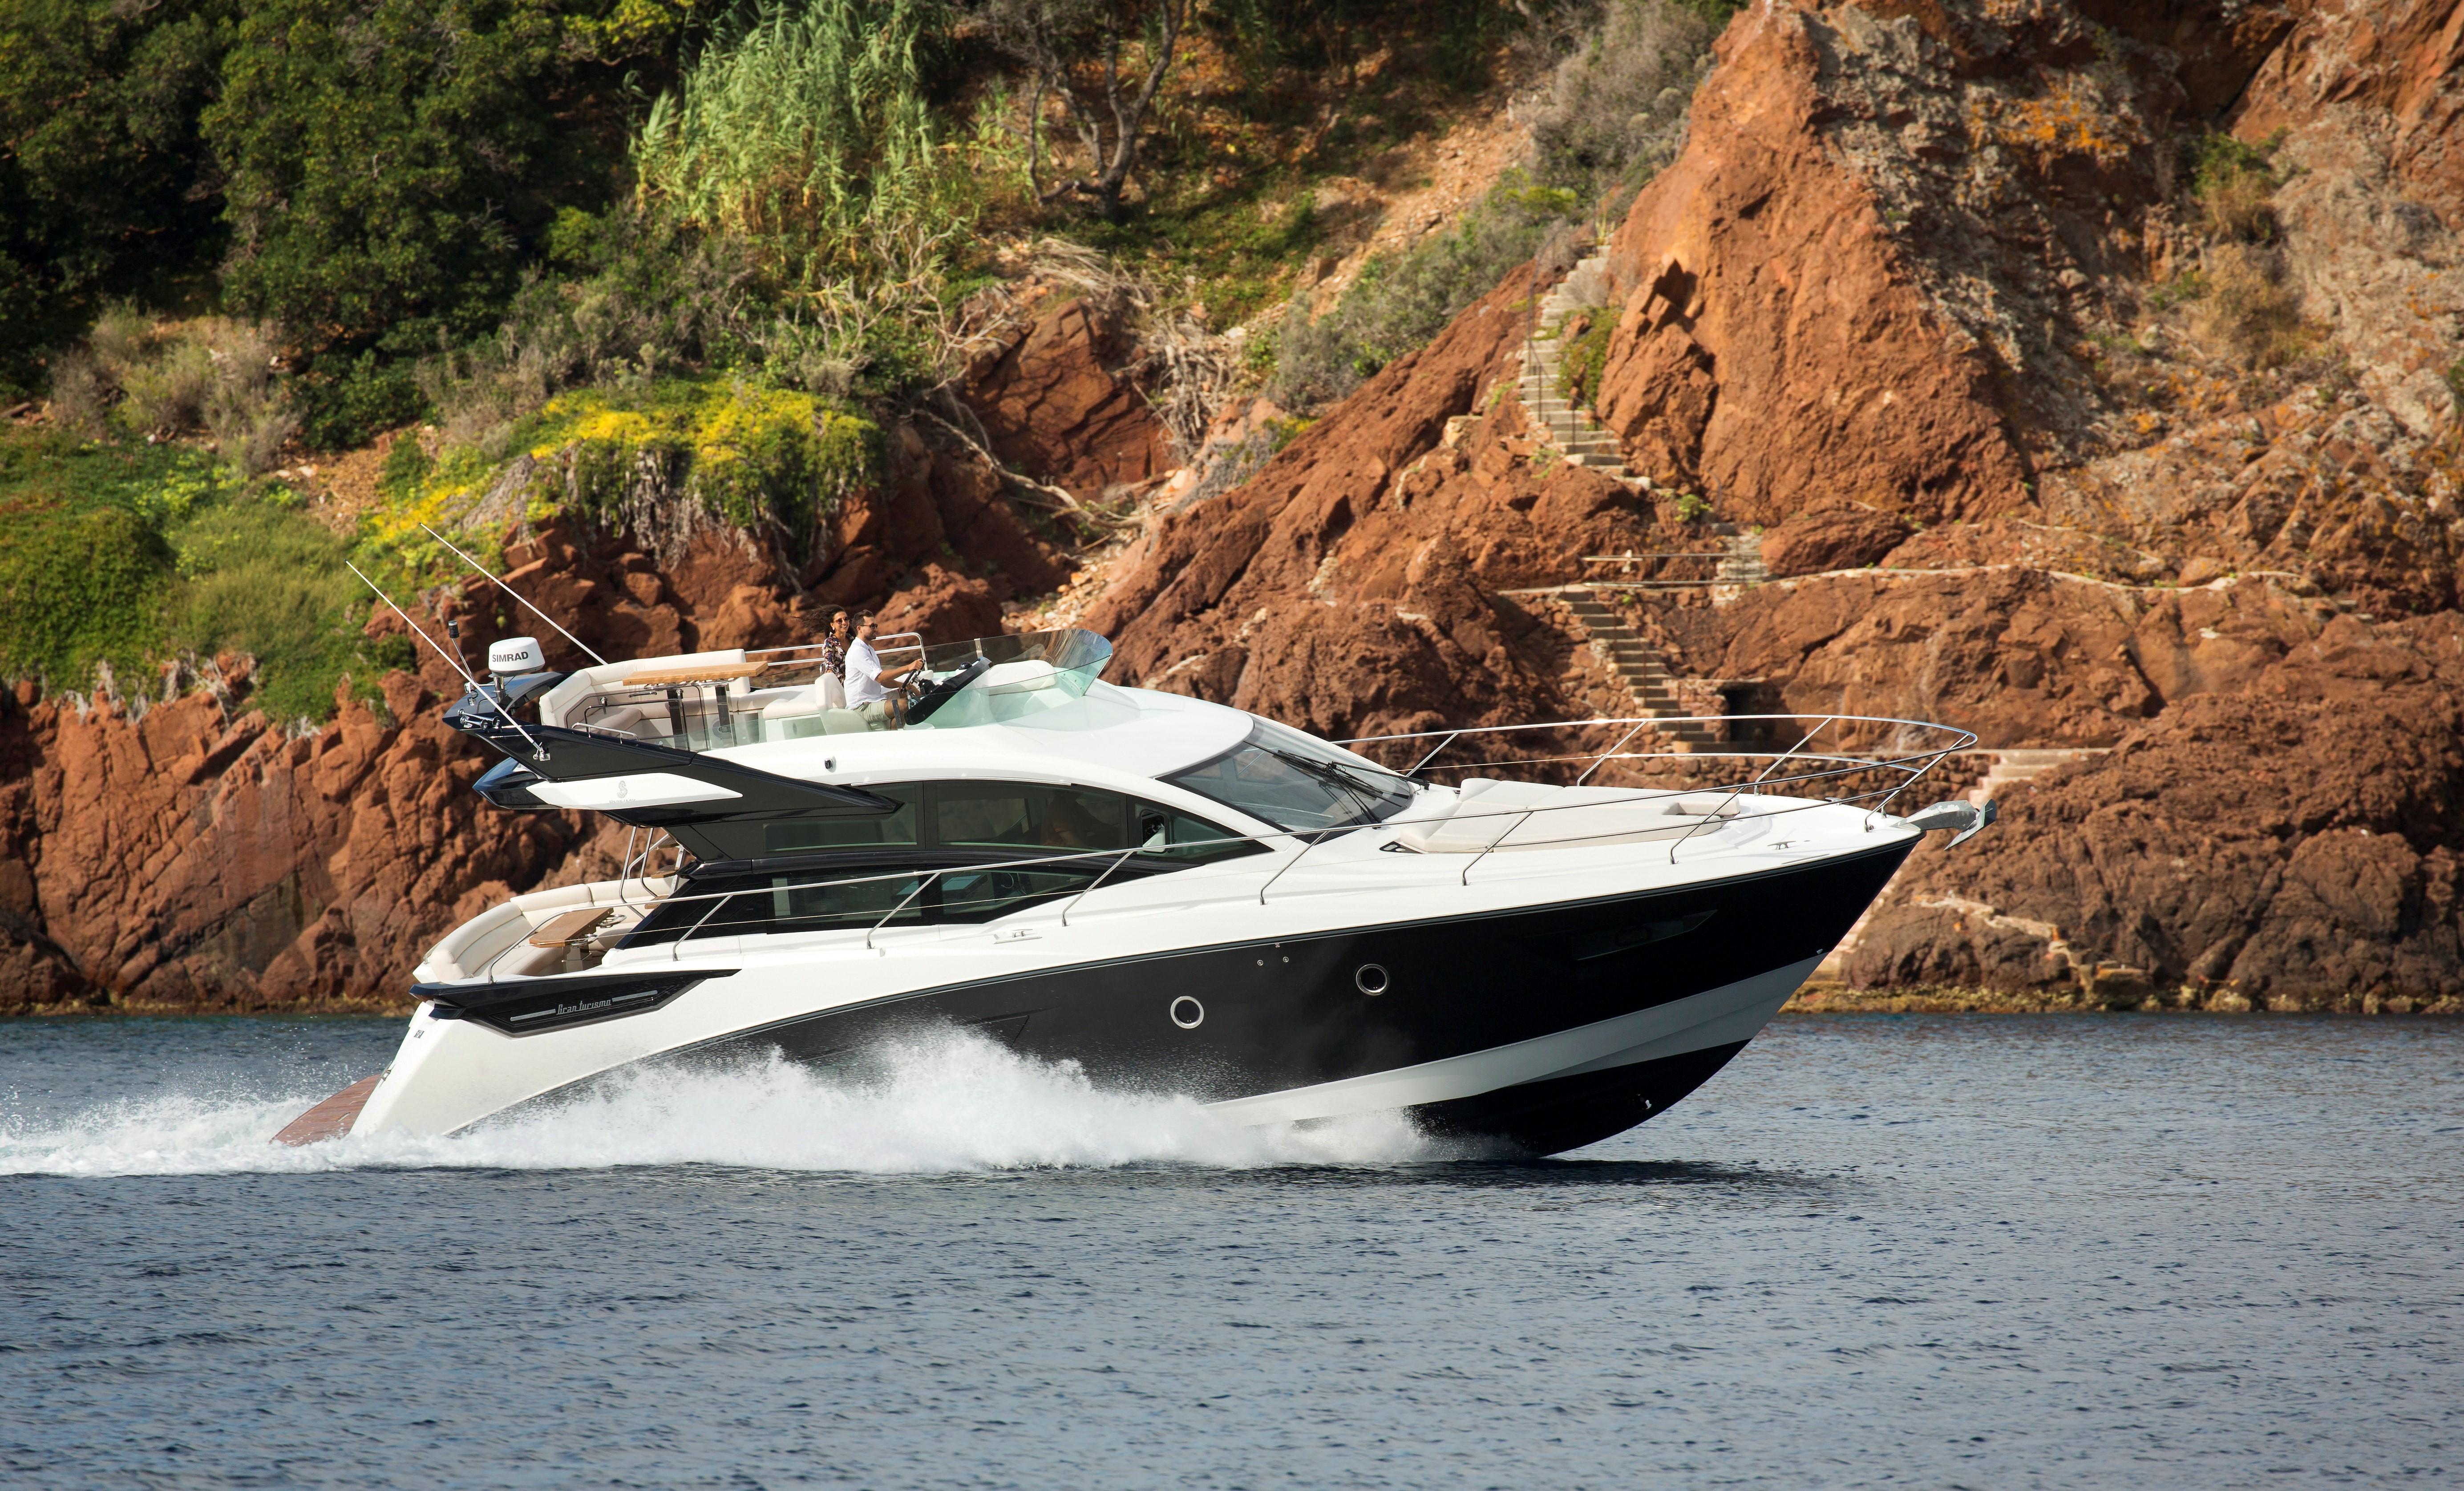 Beneteau Gran Turismo 50 Sportfly Beneteau Gran Turismo 50 Sportfly - For Sale